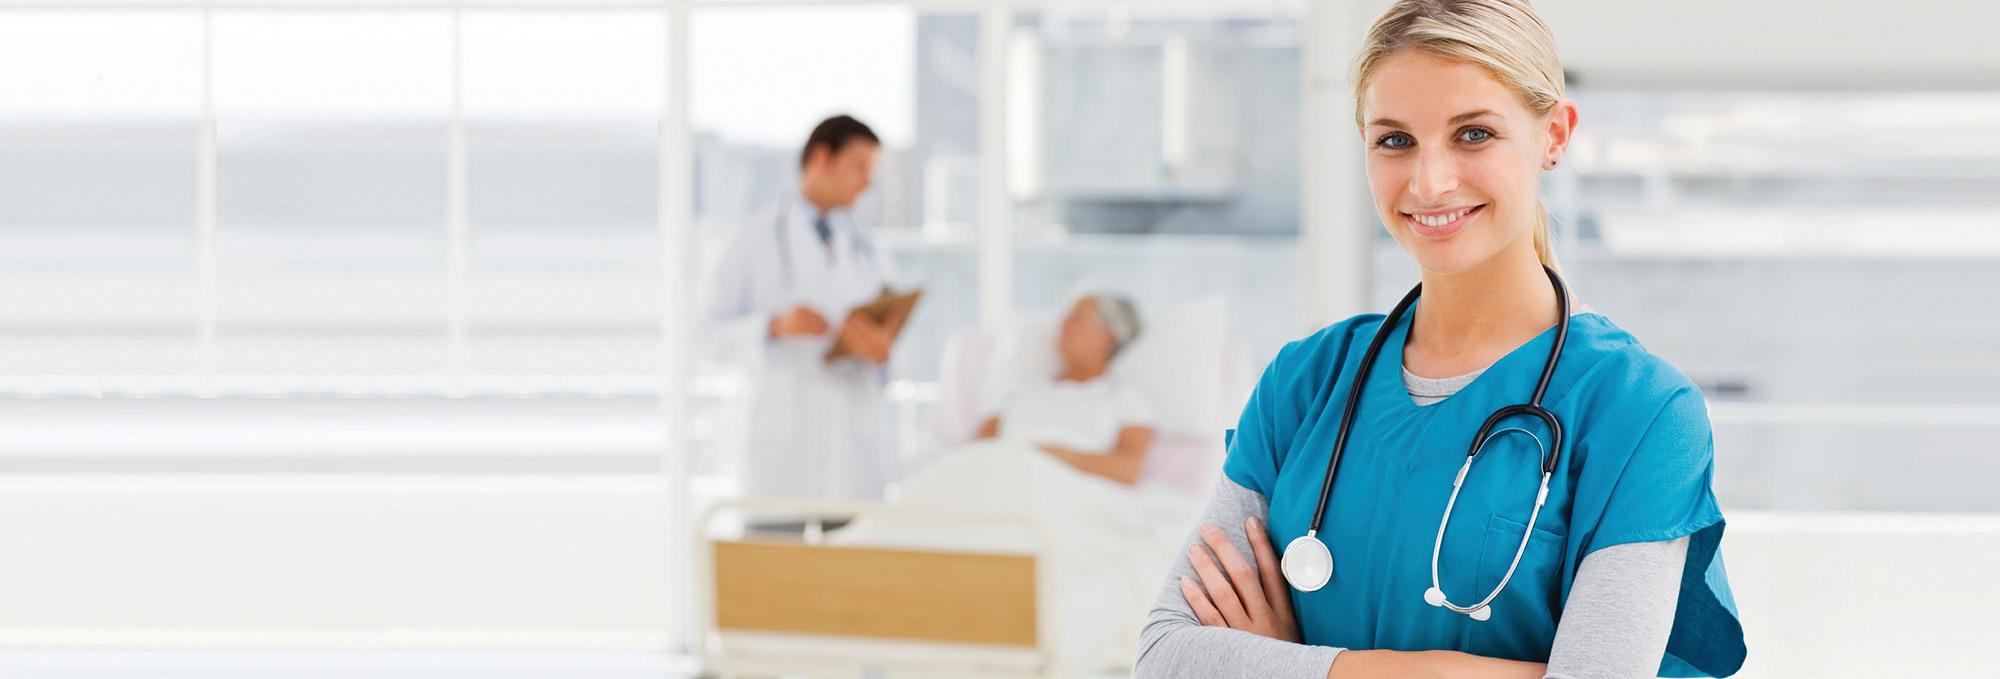 Independent Nurse Contractor